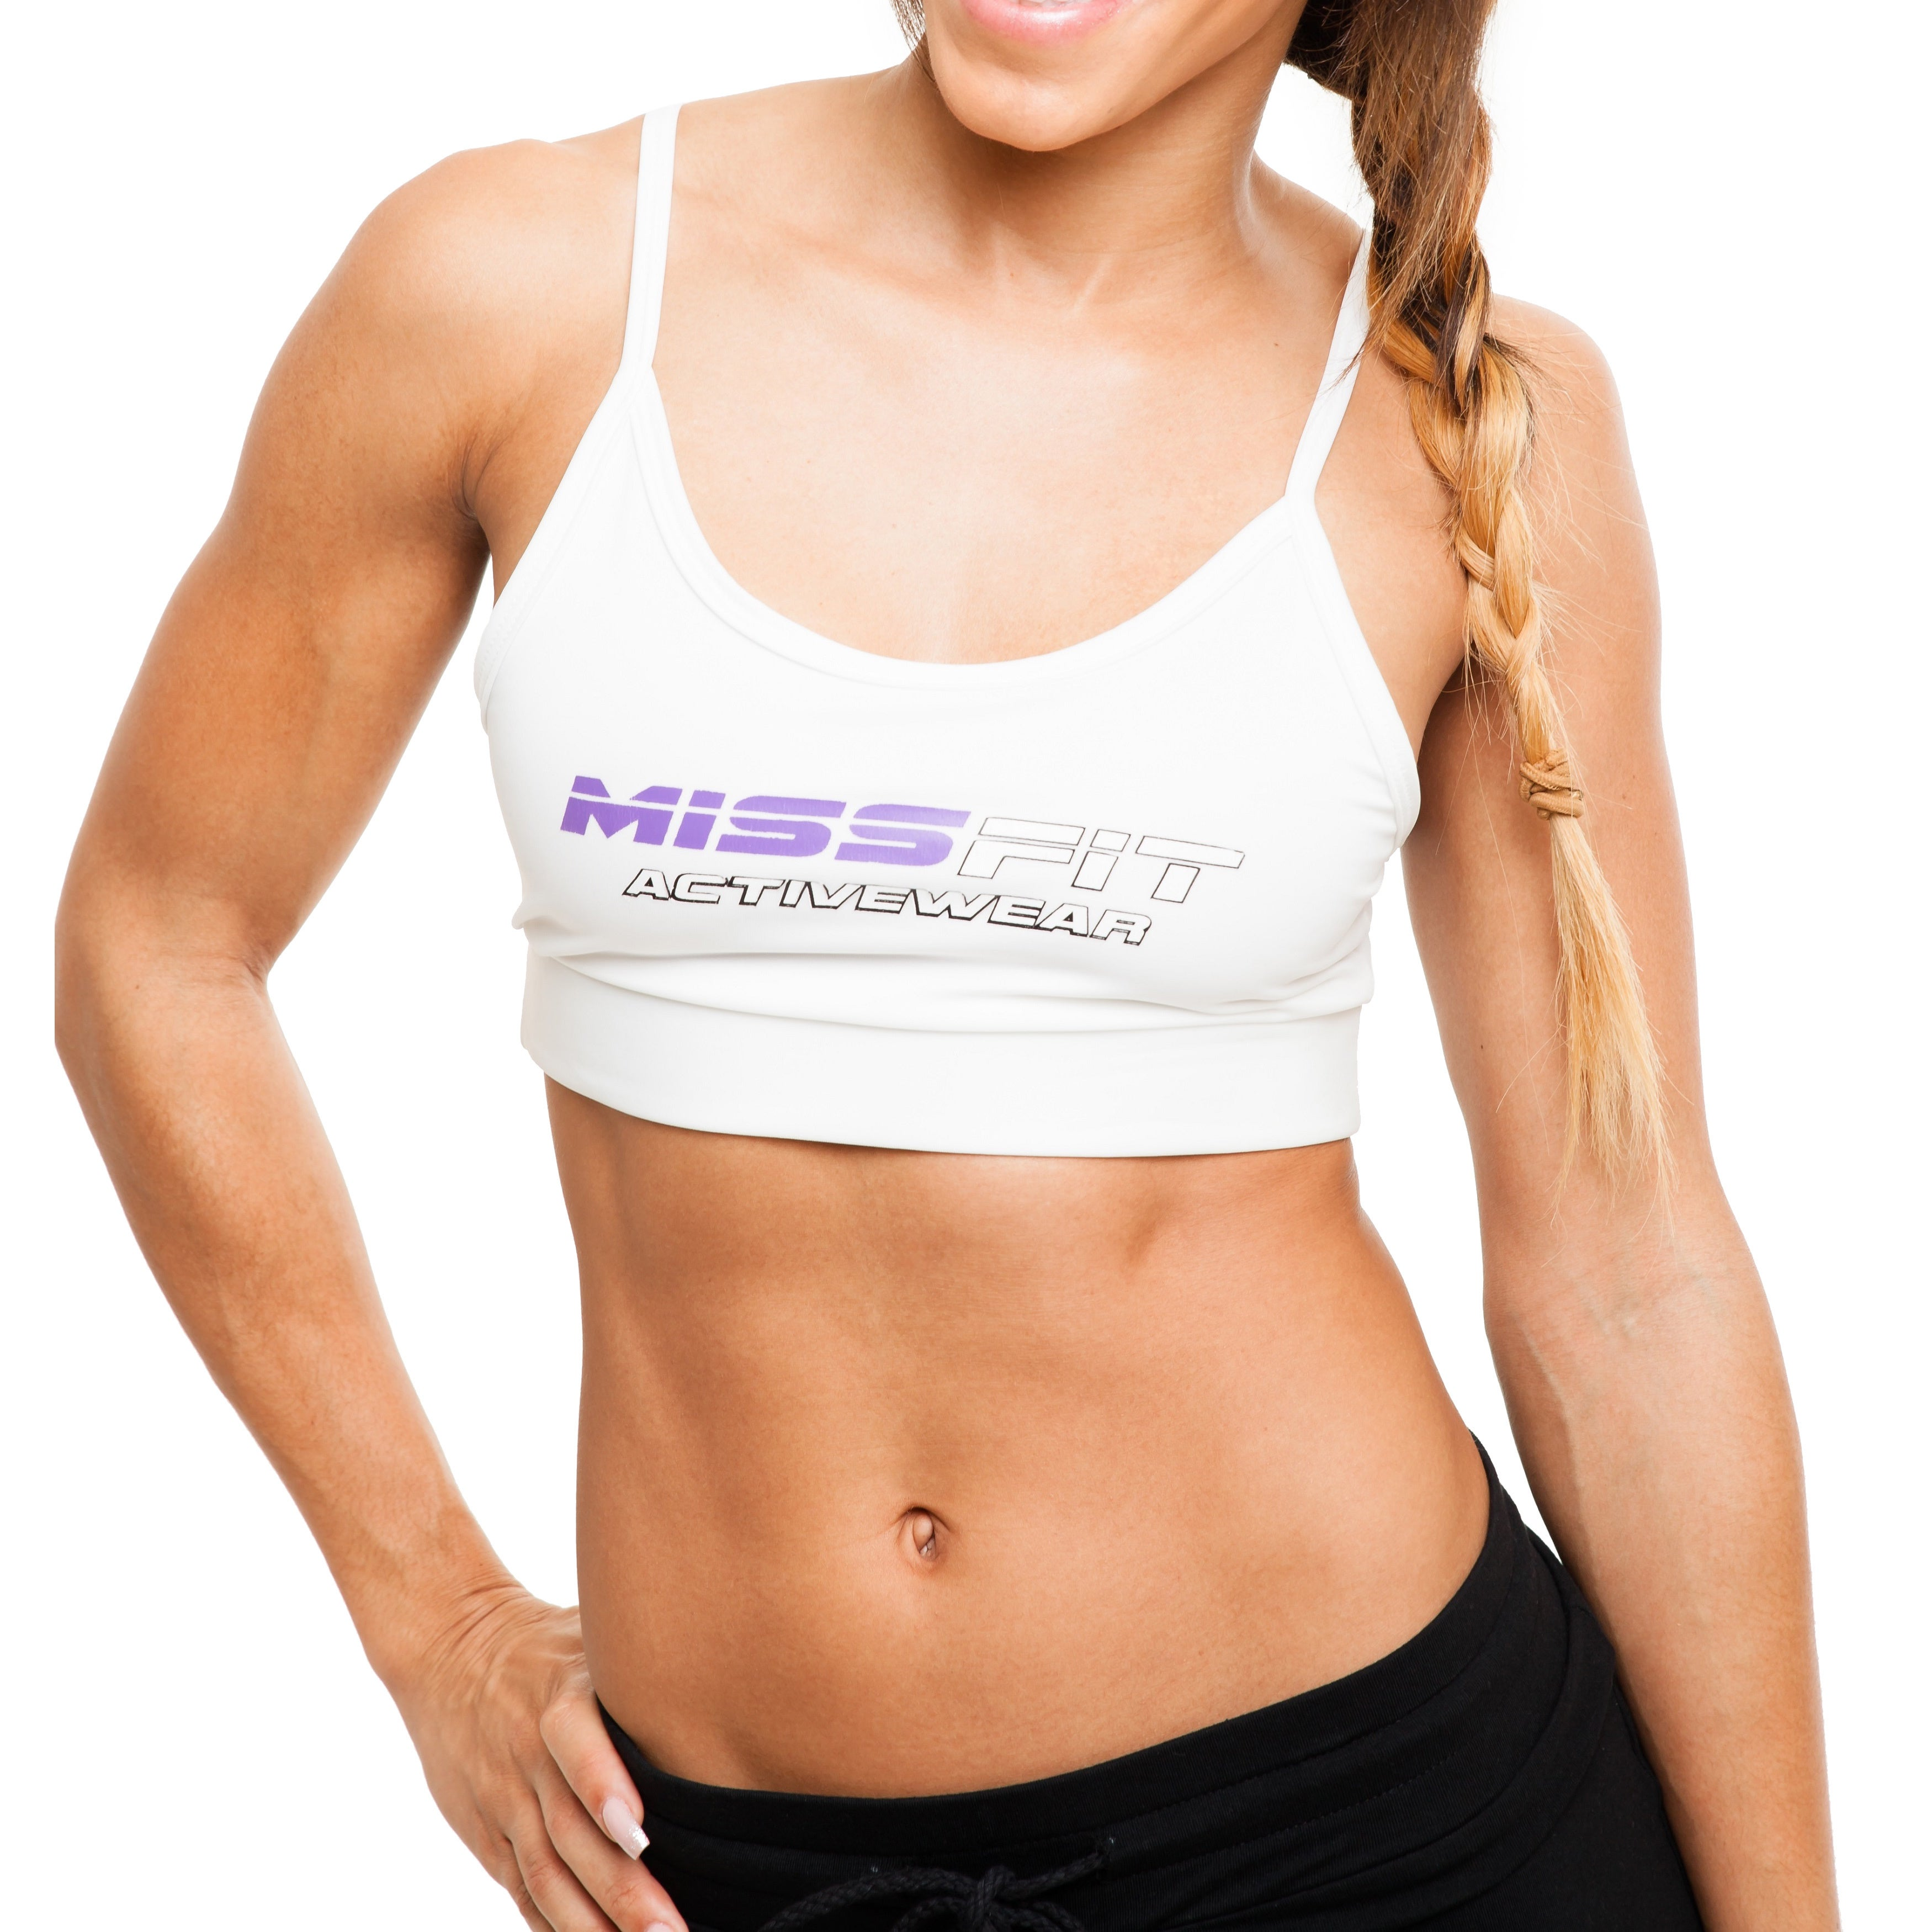 dd01e0fa47 Shop MissFit Activewear Women s White Spaghetti Strap Sports Bra - On Sale  - Free Shipping Today - Overstock - 10433300